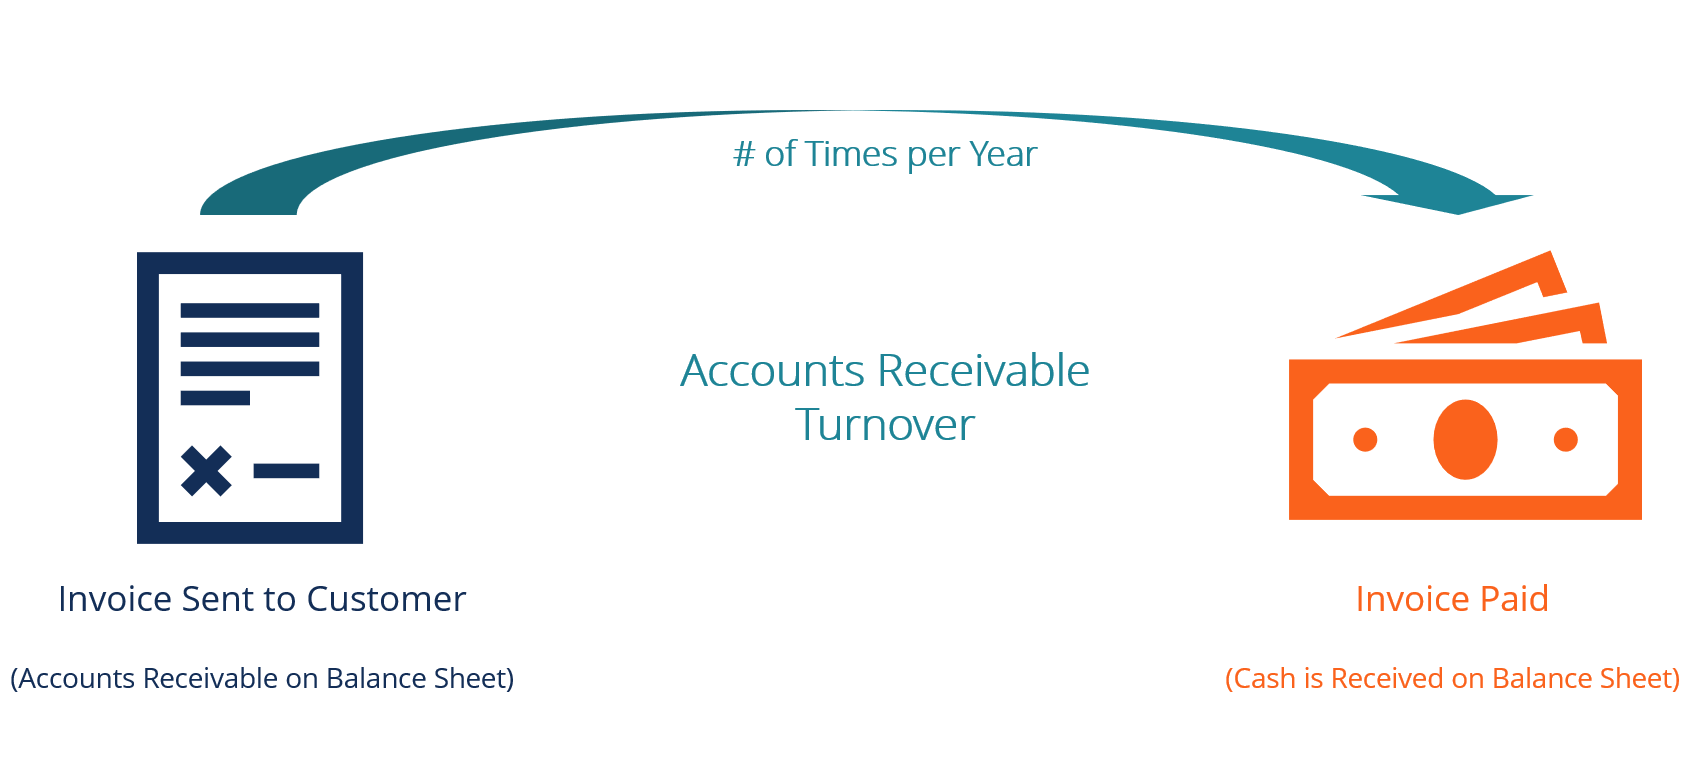 Accounts Receivable Turnover Ratio Formula Examples